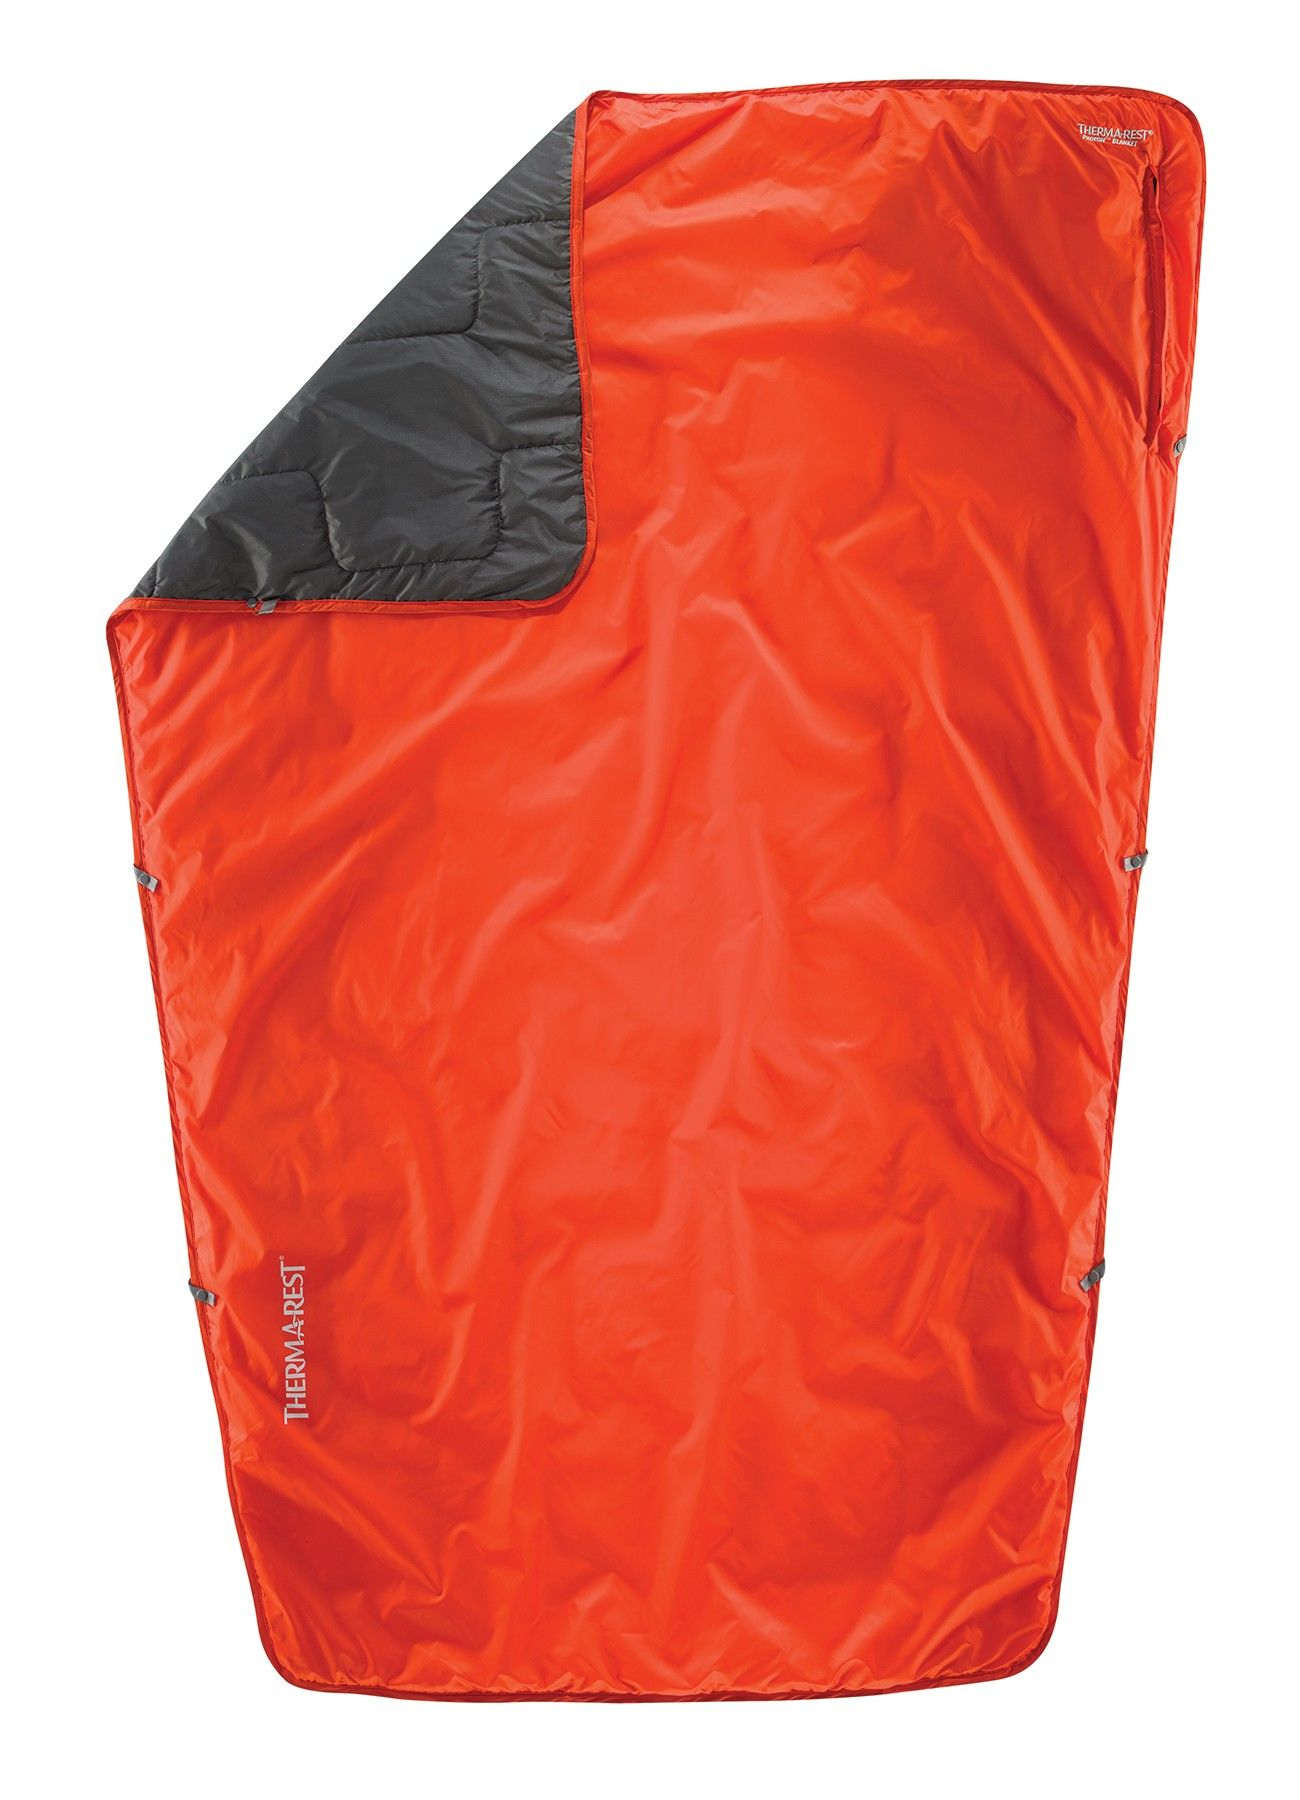 Therm-a-Rest Proton Decke | Größe One Size |  Kunstfaserschlafsack